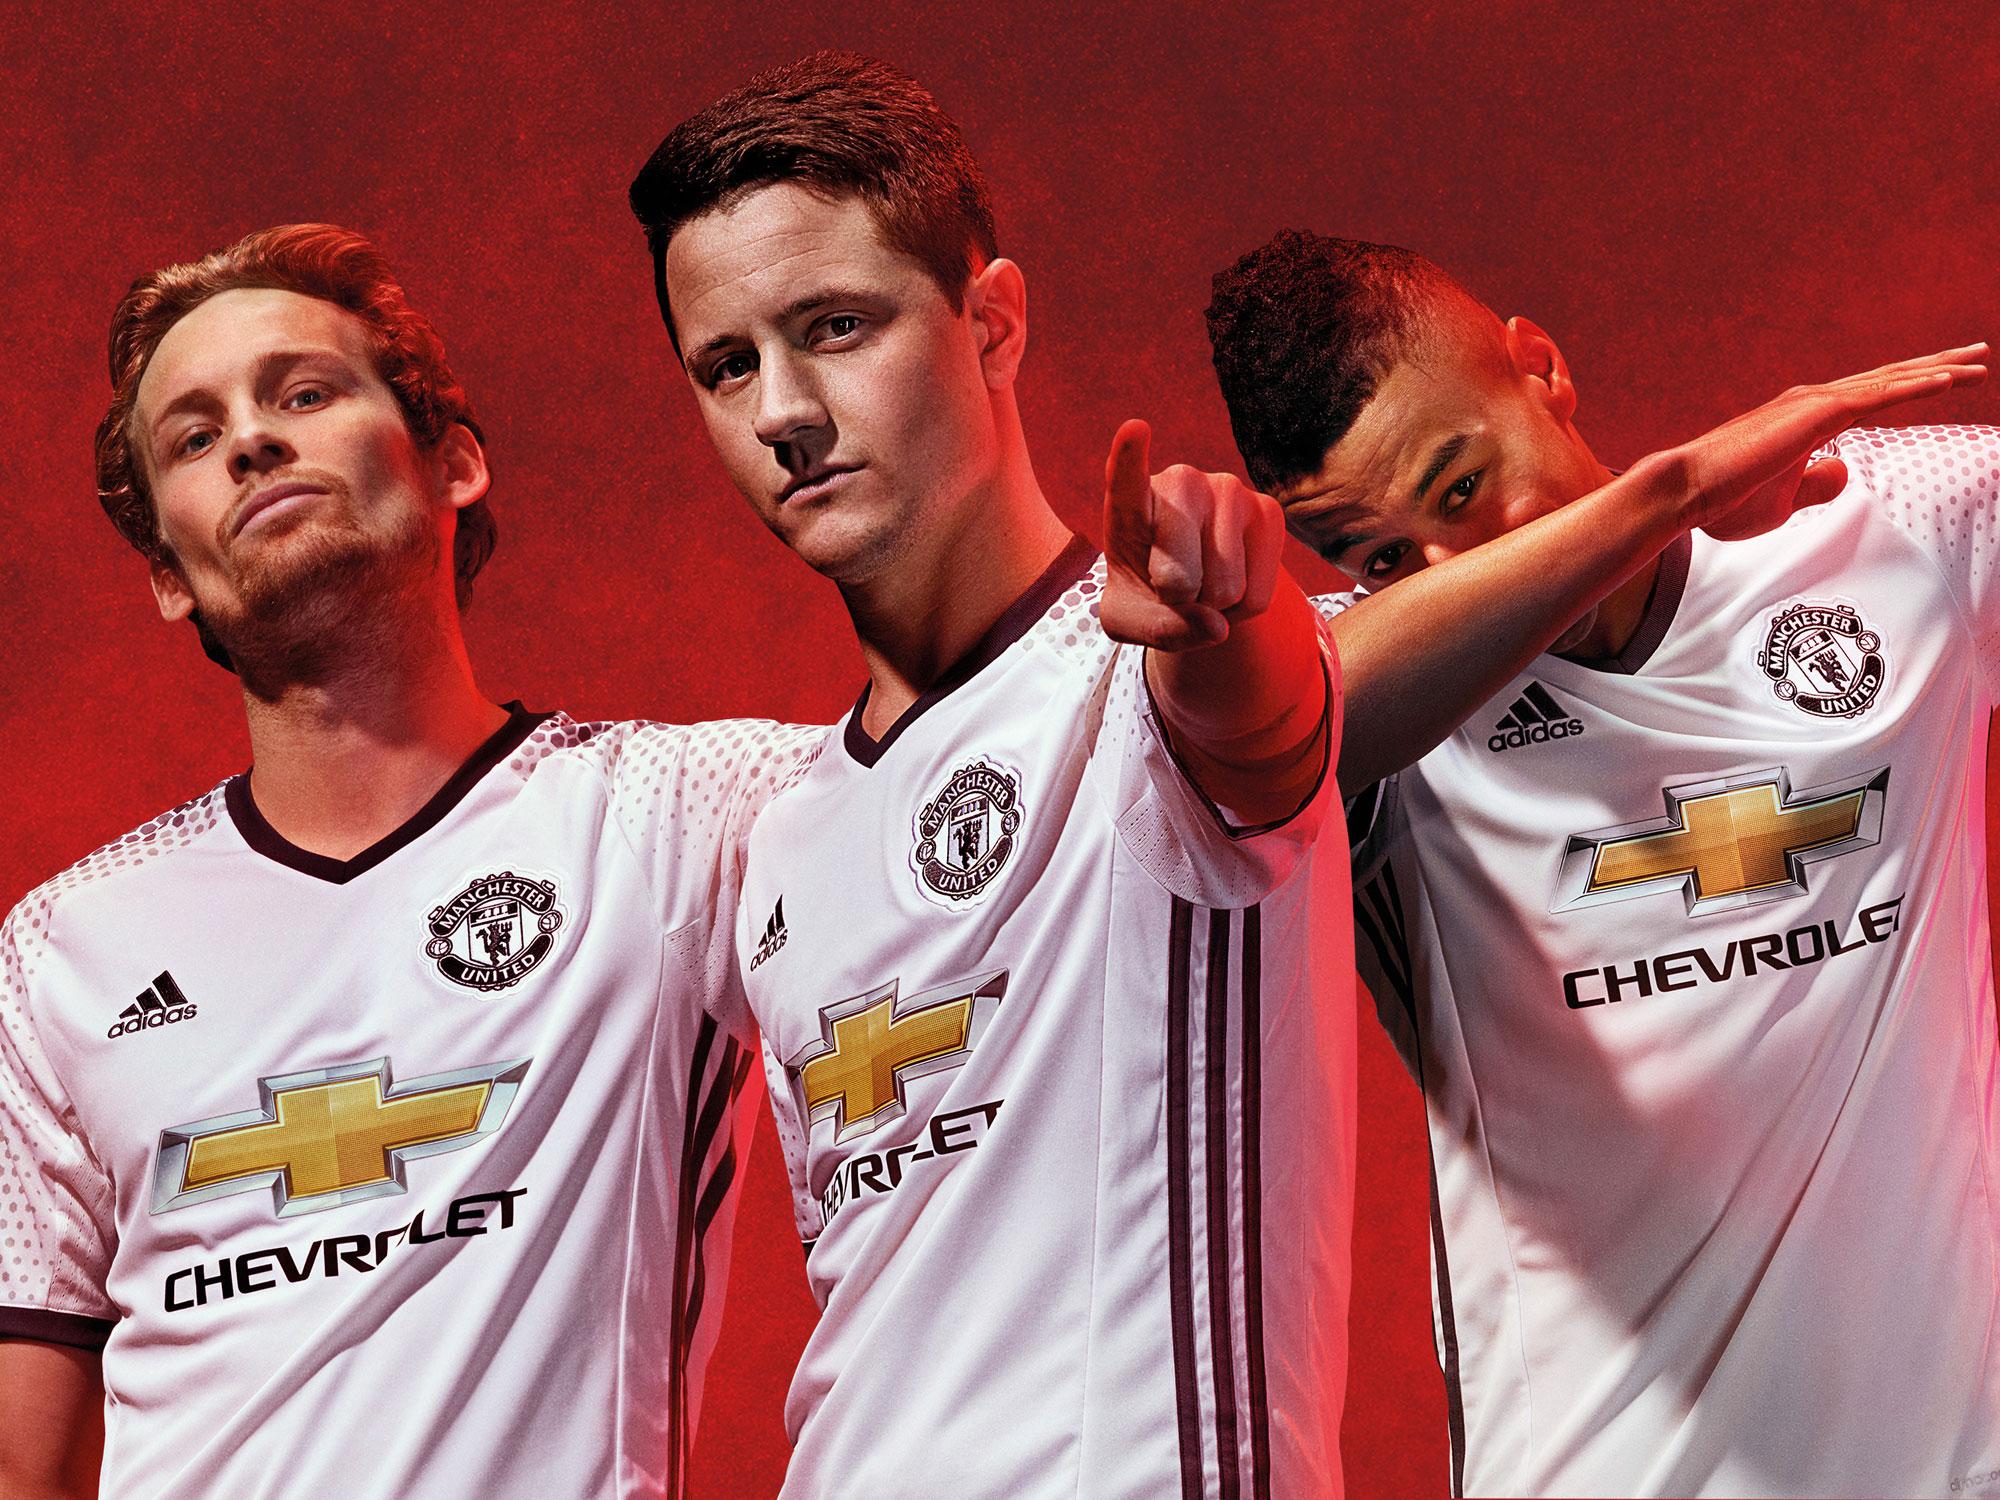 Manchester United's new third uniform